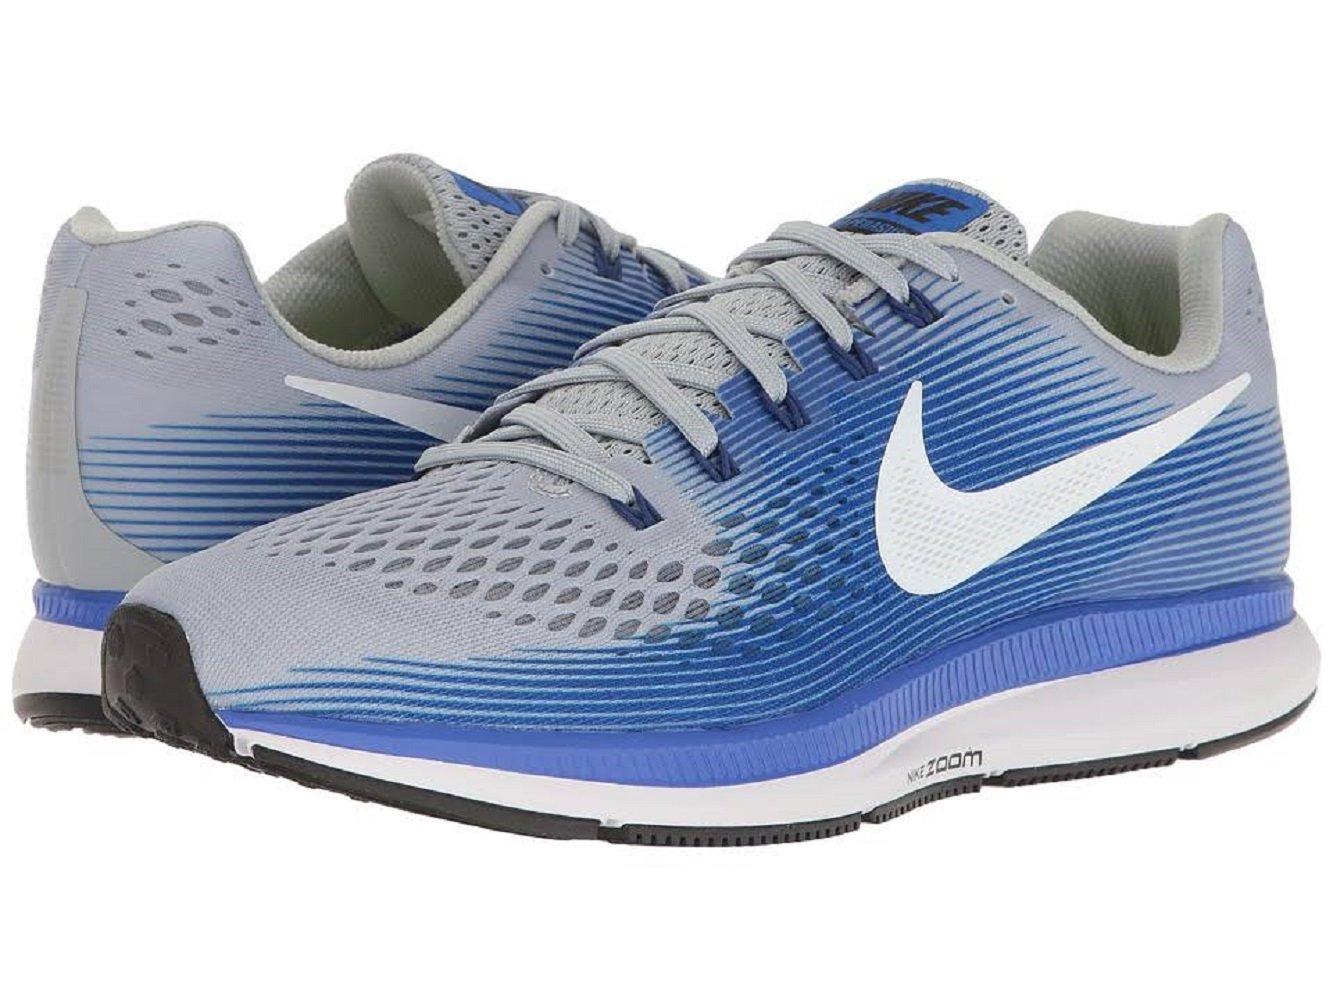 hot sale online e53a5 78f77 Galleon - NIKE Men s Air Zoom Pegasus 34 Running Shoes (8.5, Grey Blue-EW)